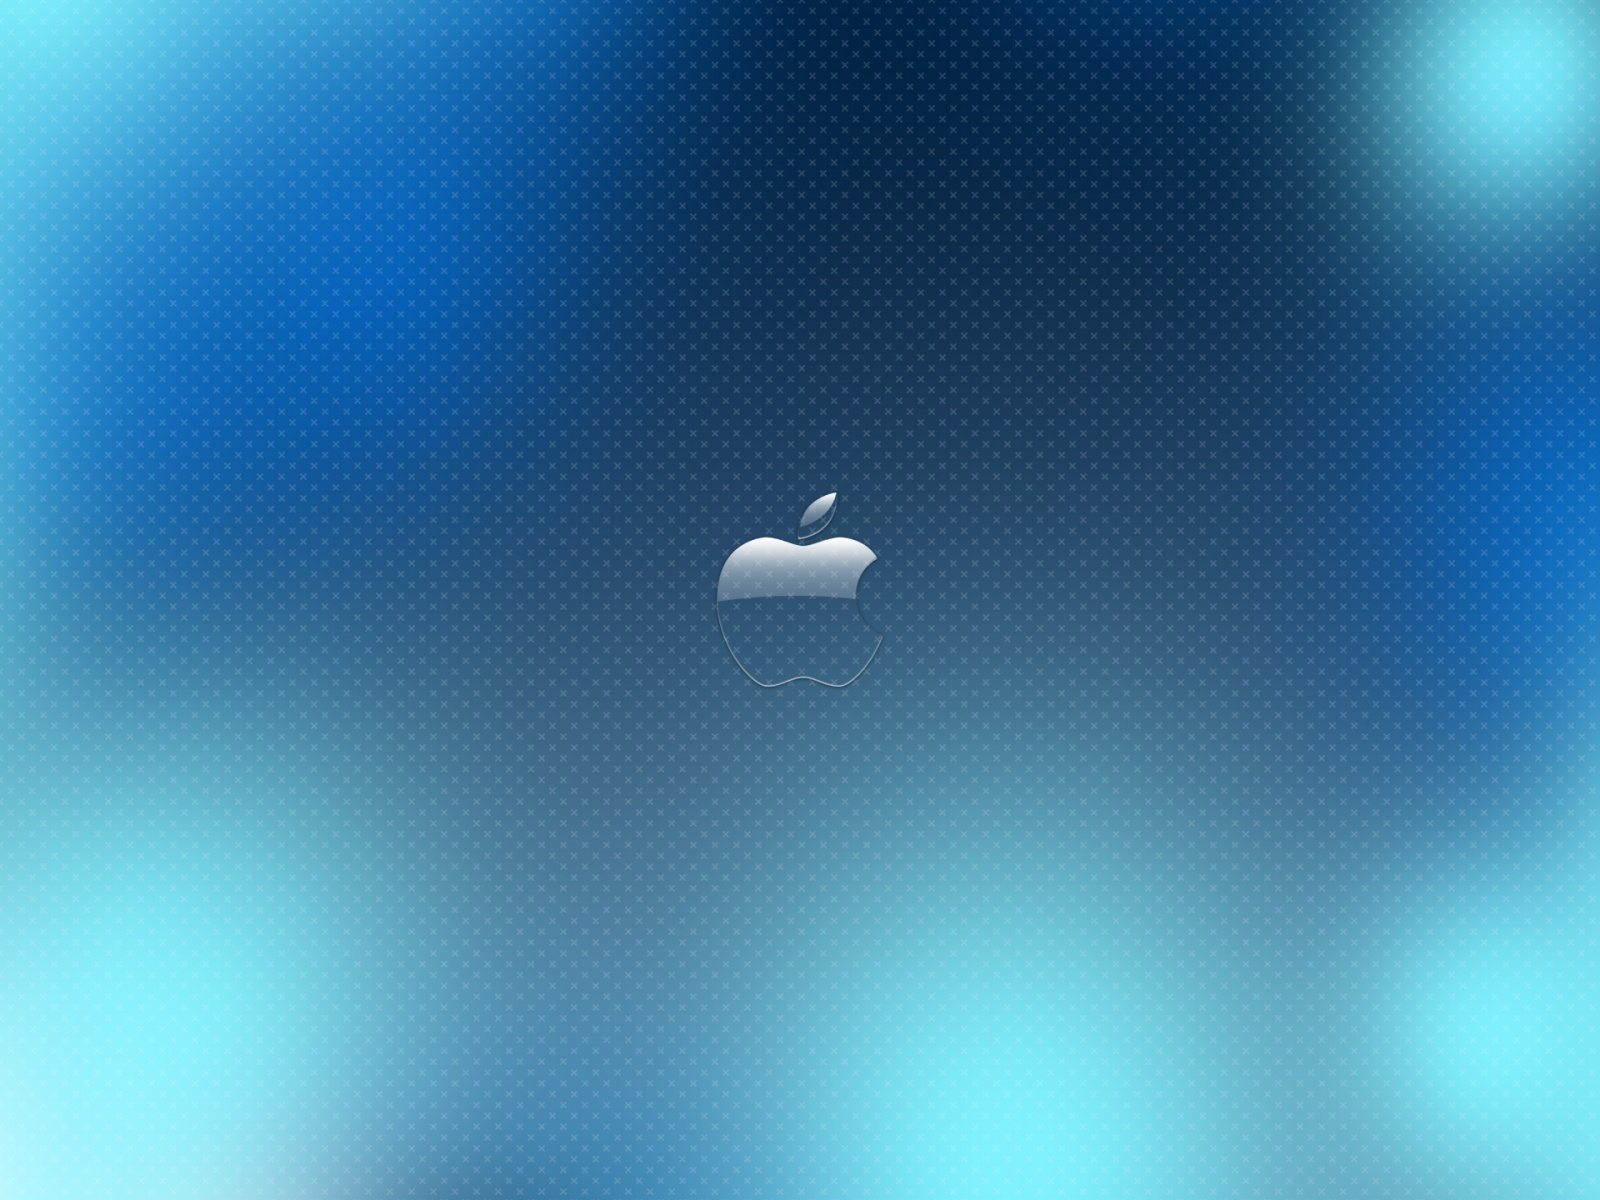 how to change safari background on mac